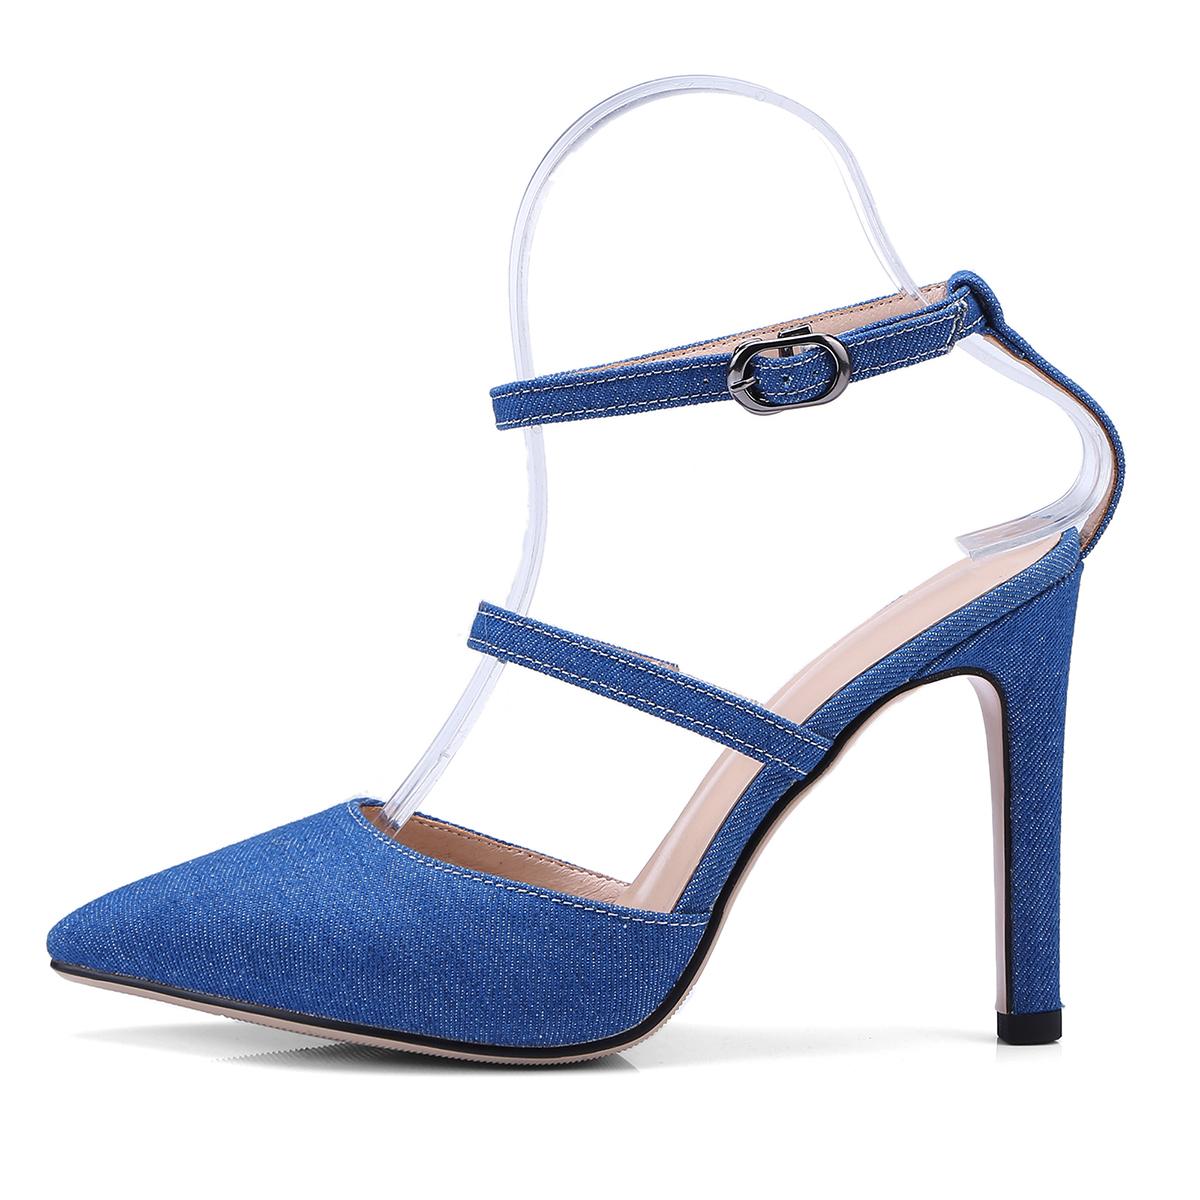 b4b5fead382 US  40 - Arden Furtado 2018 summer high heels 10cm stilettos pointed toe  blue jeans red ankle strap sexy high heels elegant sandals new -  www.ardenfurtado. ...